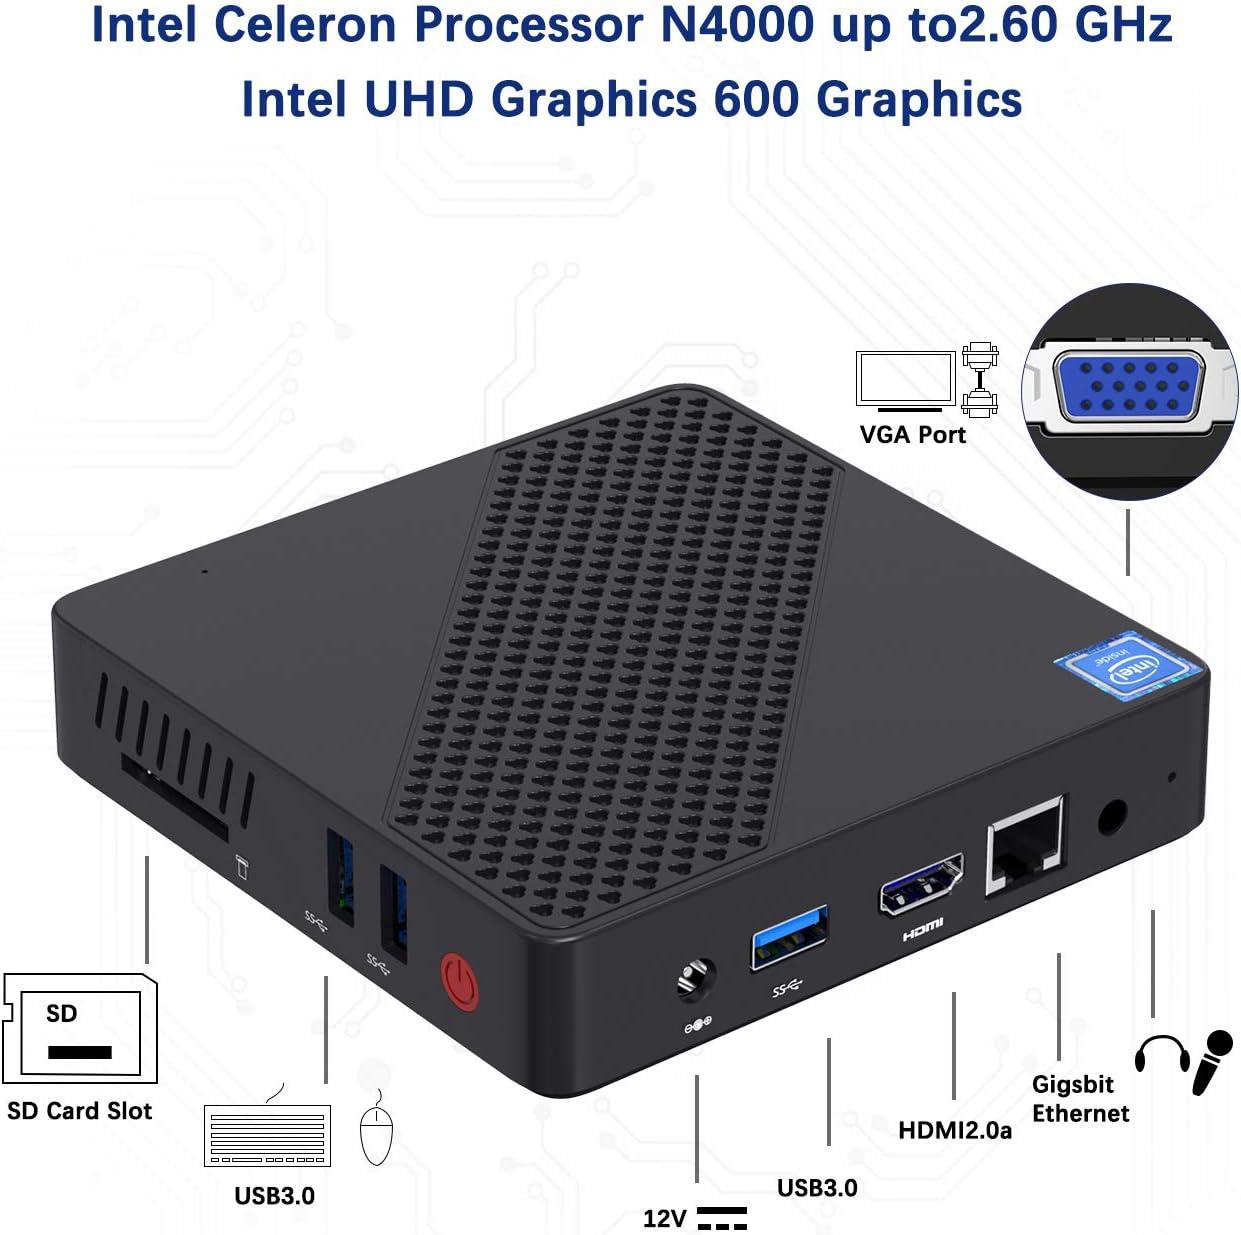 DDR4 4GB//64GB eMMC Mini PC Fanless UHD 4k@60Hz Auto Power On USB3.0 Mini Computer Support HDMI2.0a/&VGA 2.4//5.8G Wi-Fi Mini PC Intel Celeron N4000 DIY NGFF 2242 SSD up to 2.6GHz